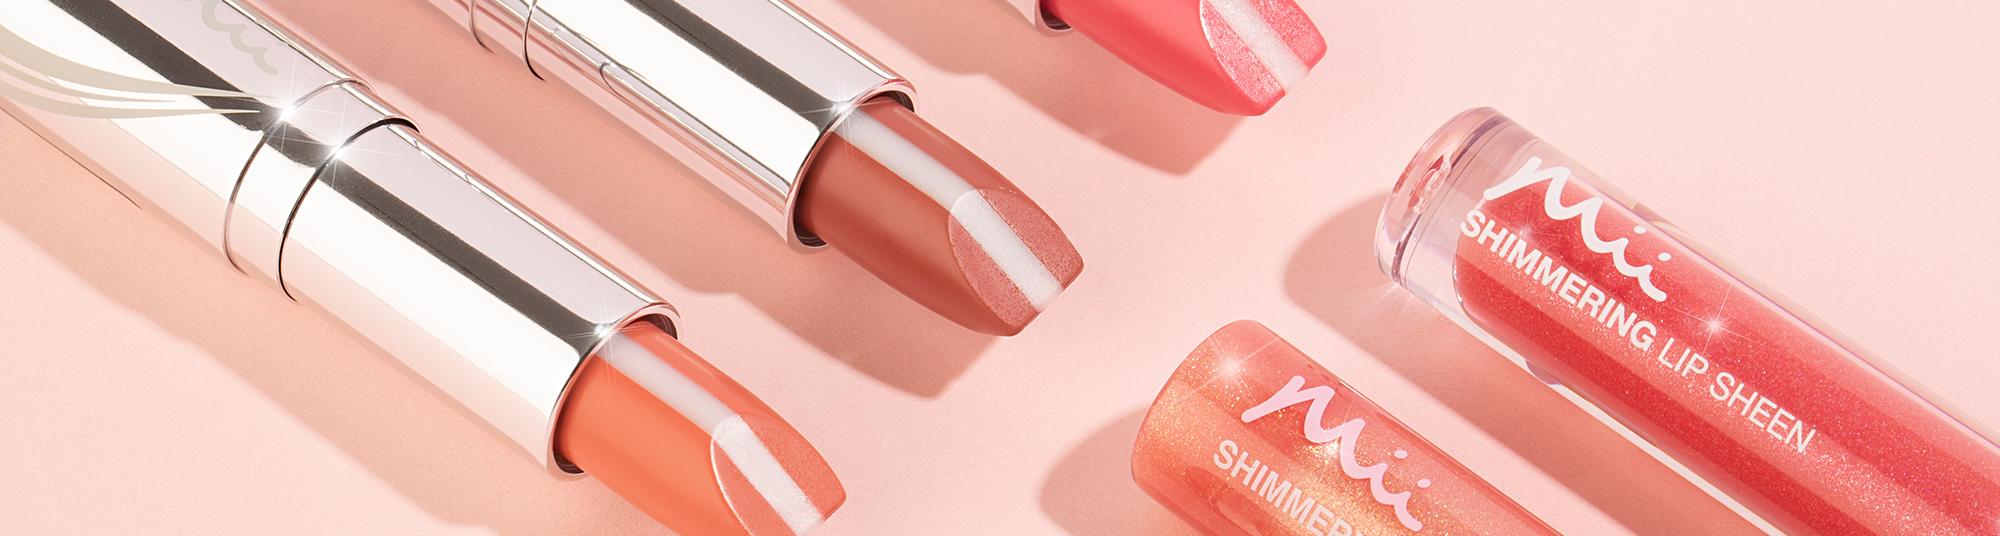 Mii Cosmetics Lip Category